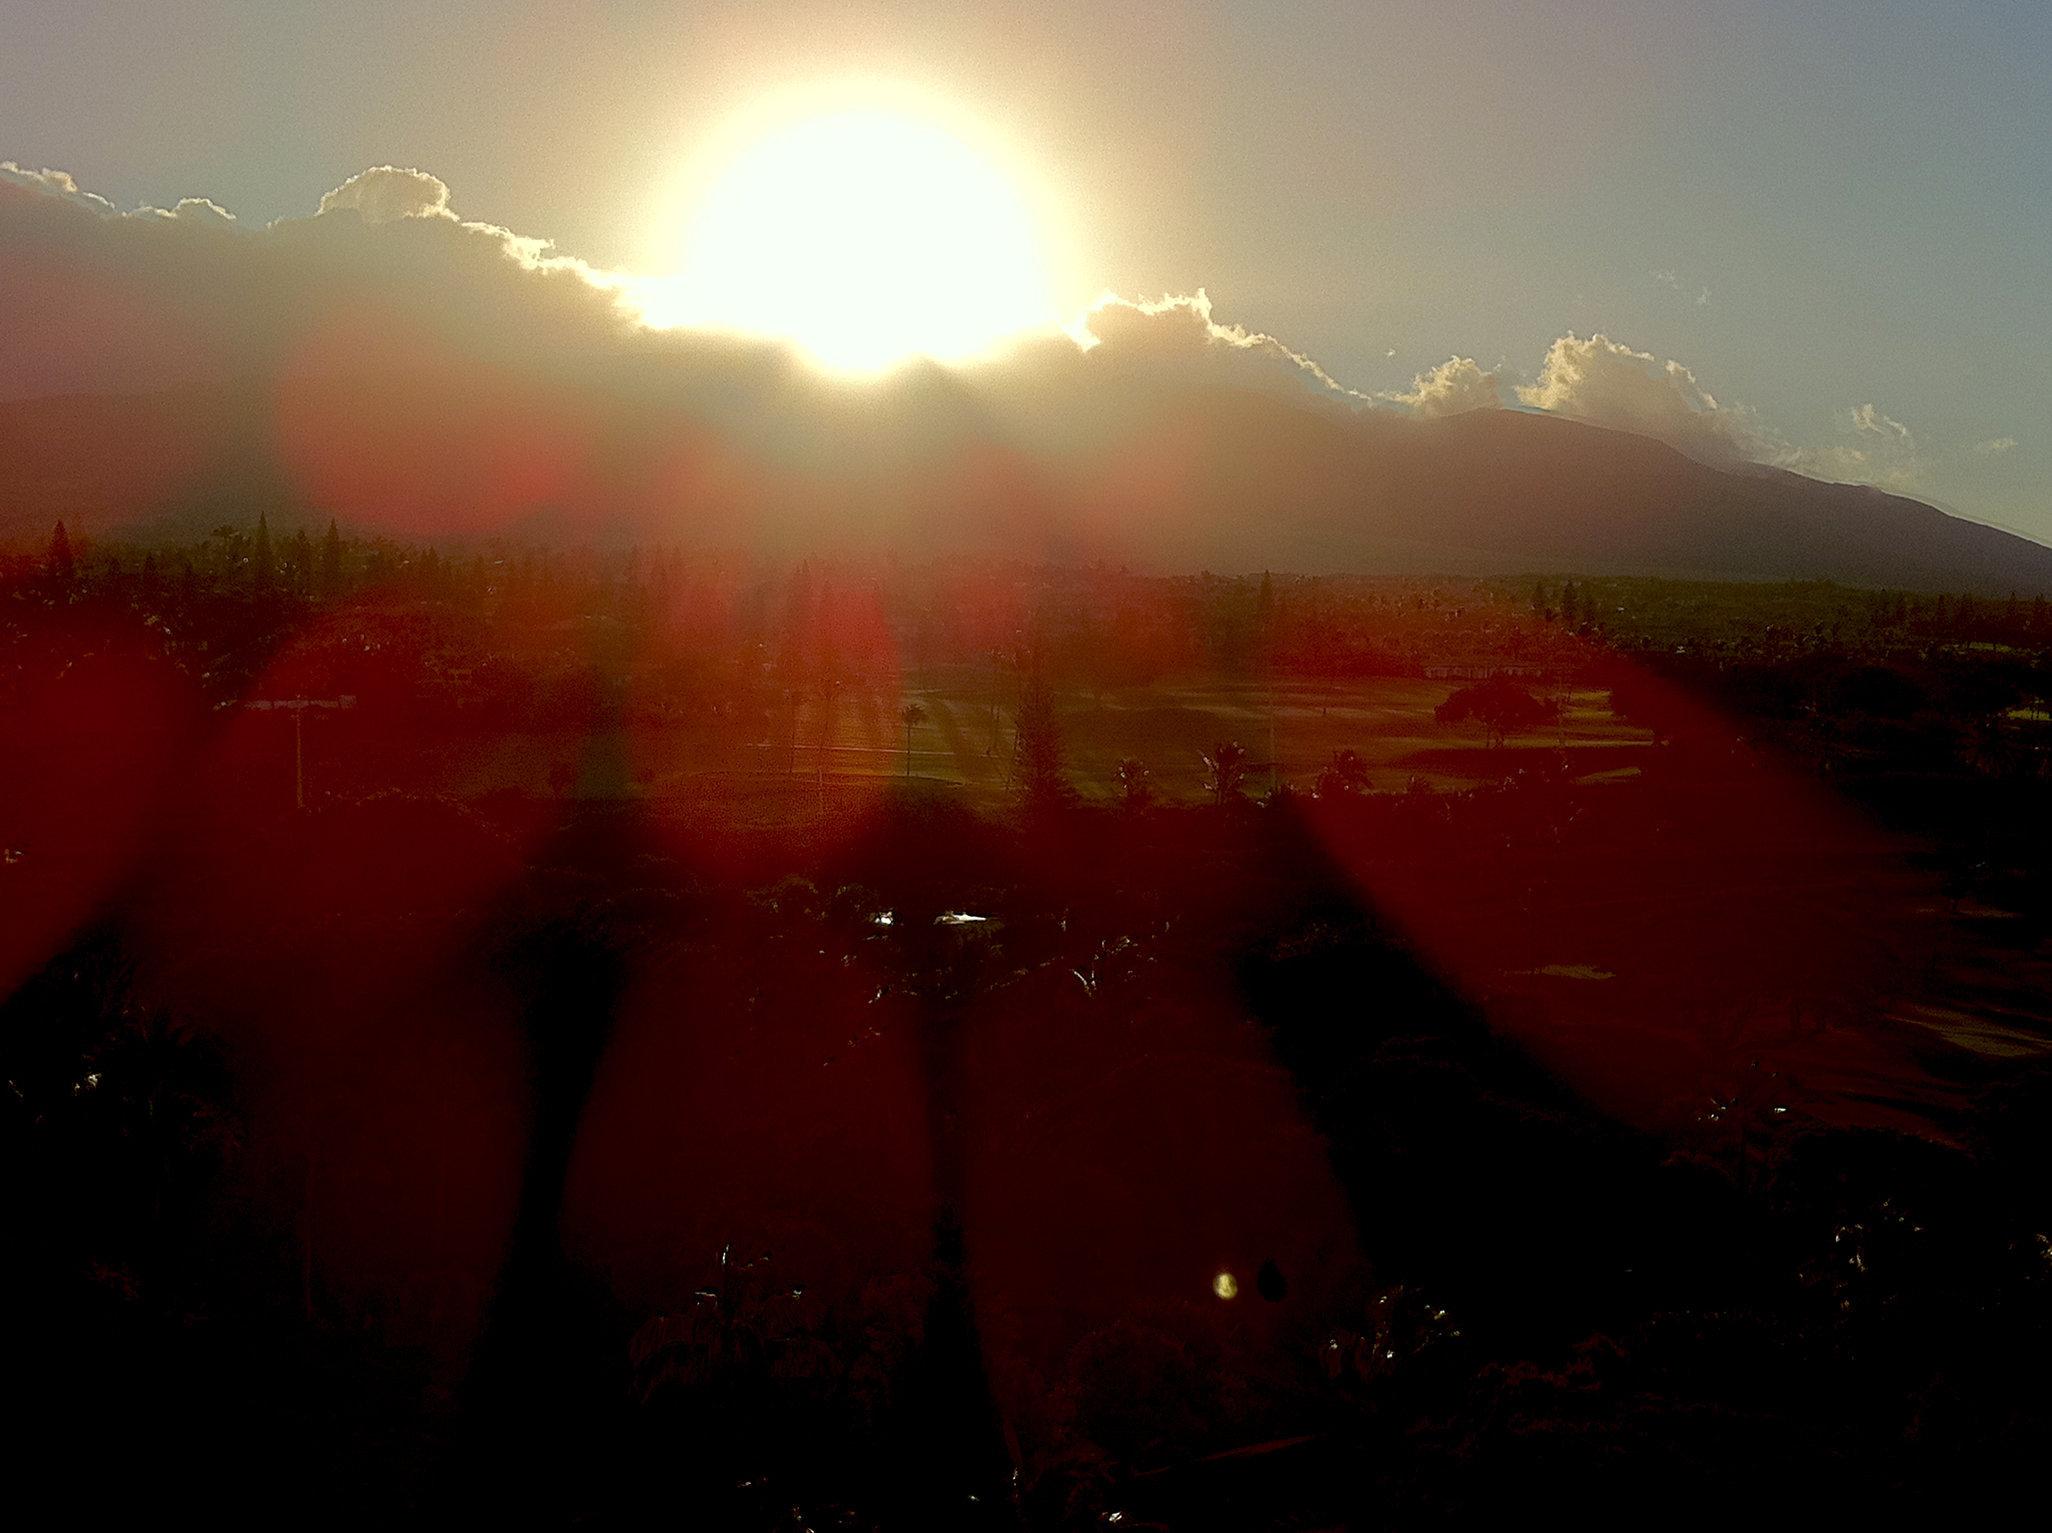 © CORDAY - West Maui Daybreak